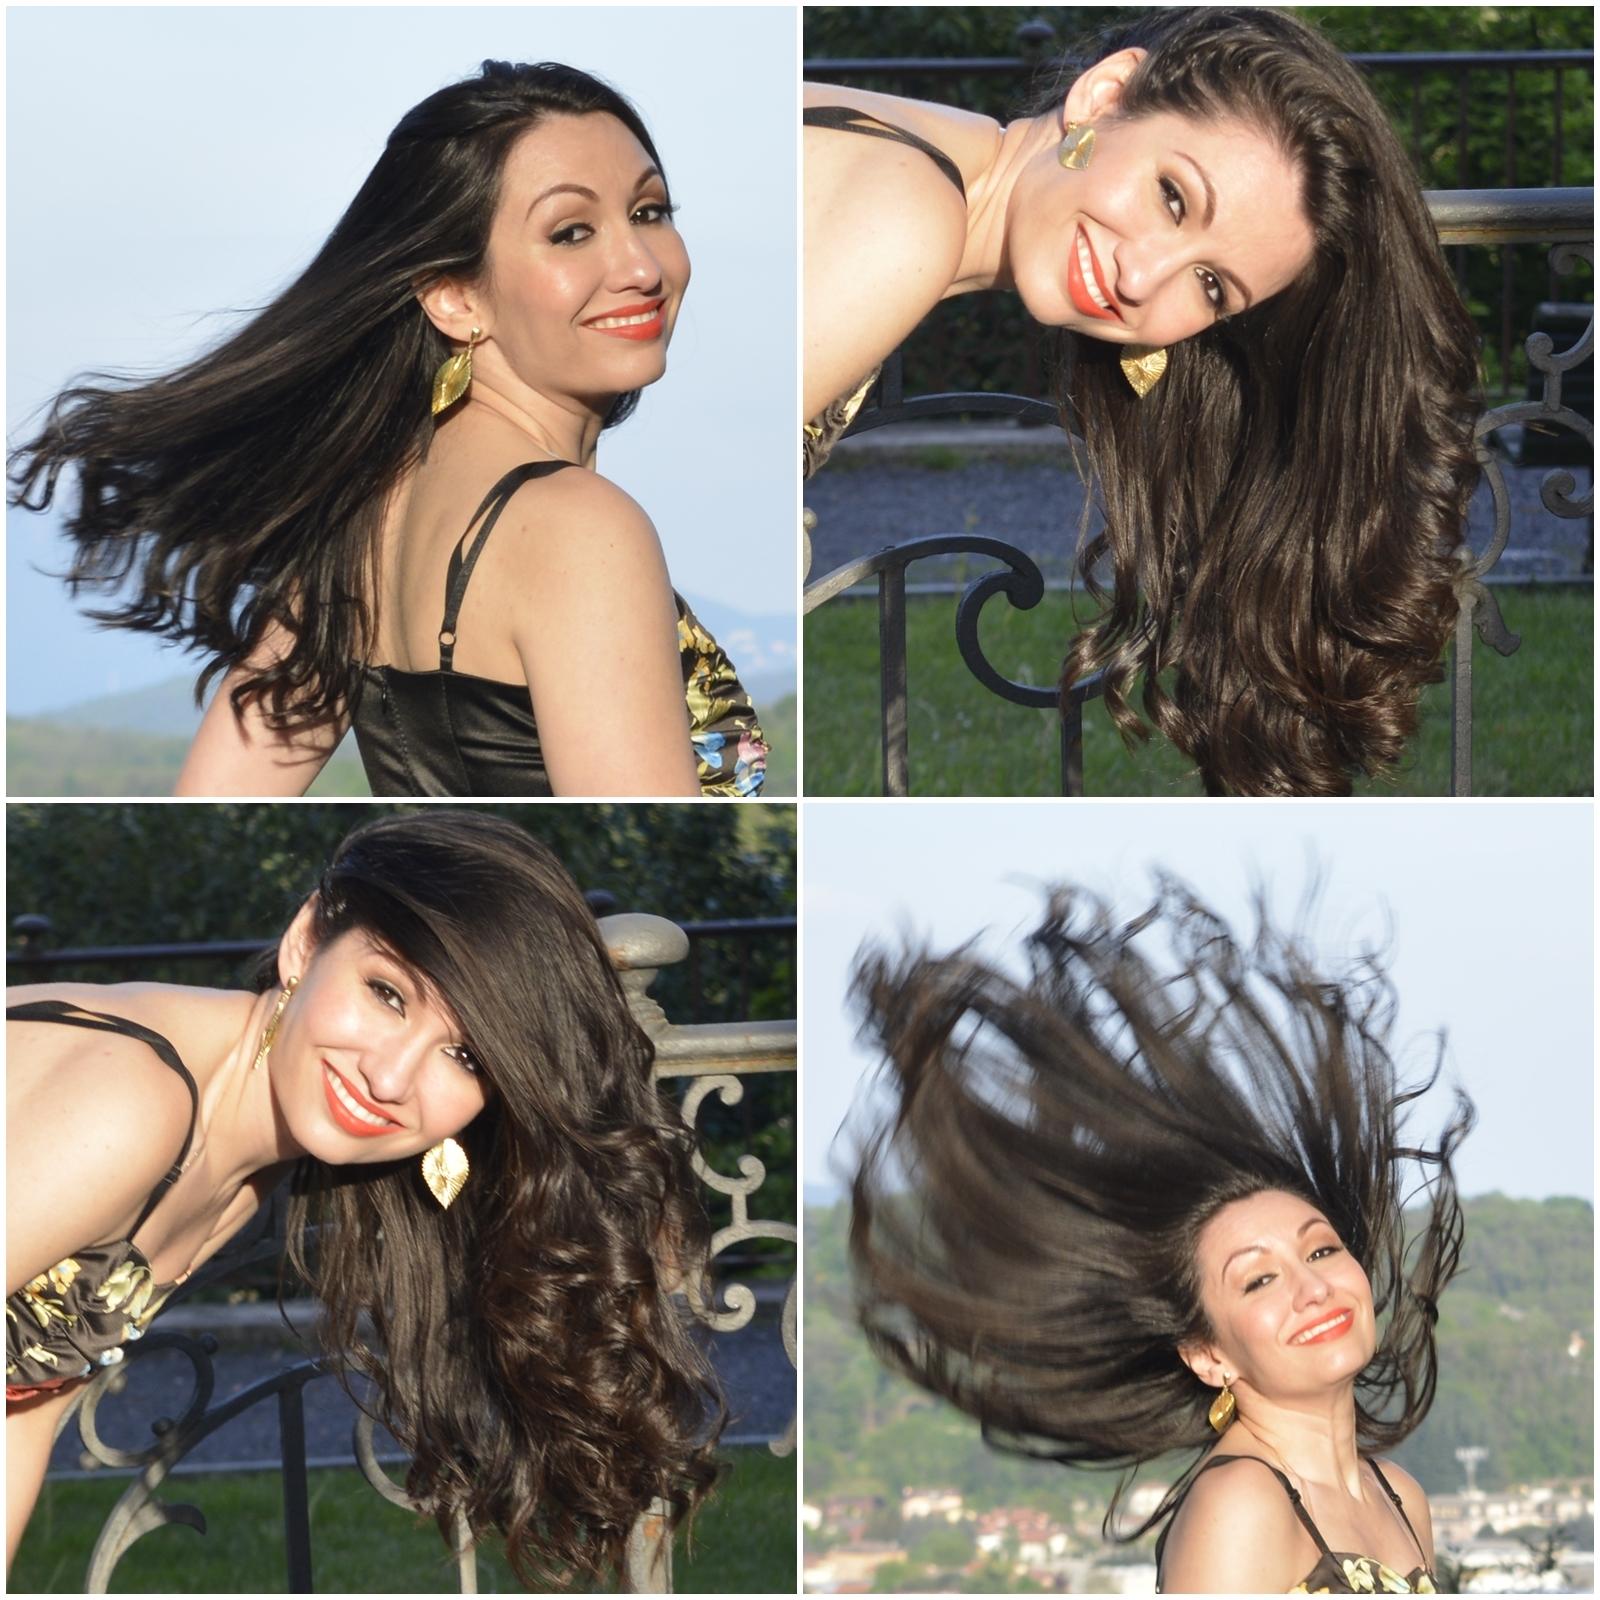 cabelos-protetor-termico-pantene-spray-lucentezza-termo-protezione-nathália-ferrara-2